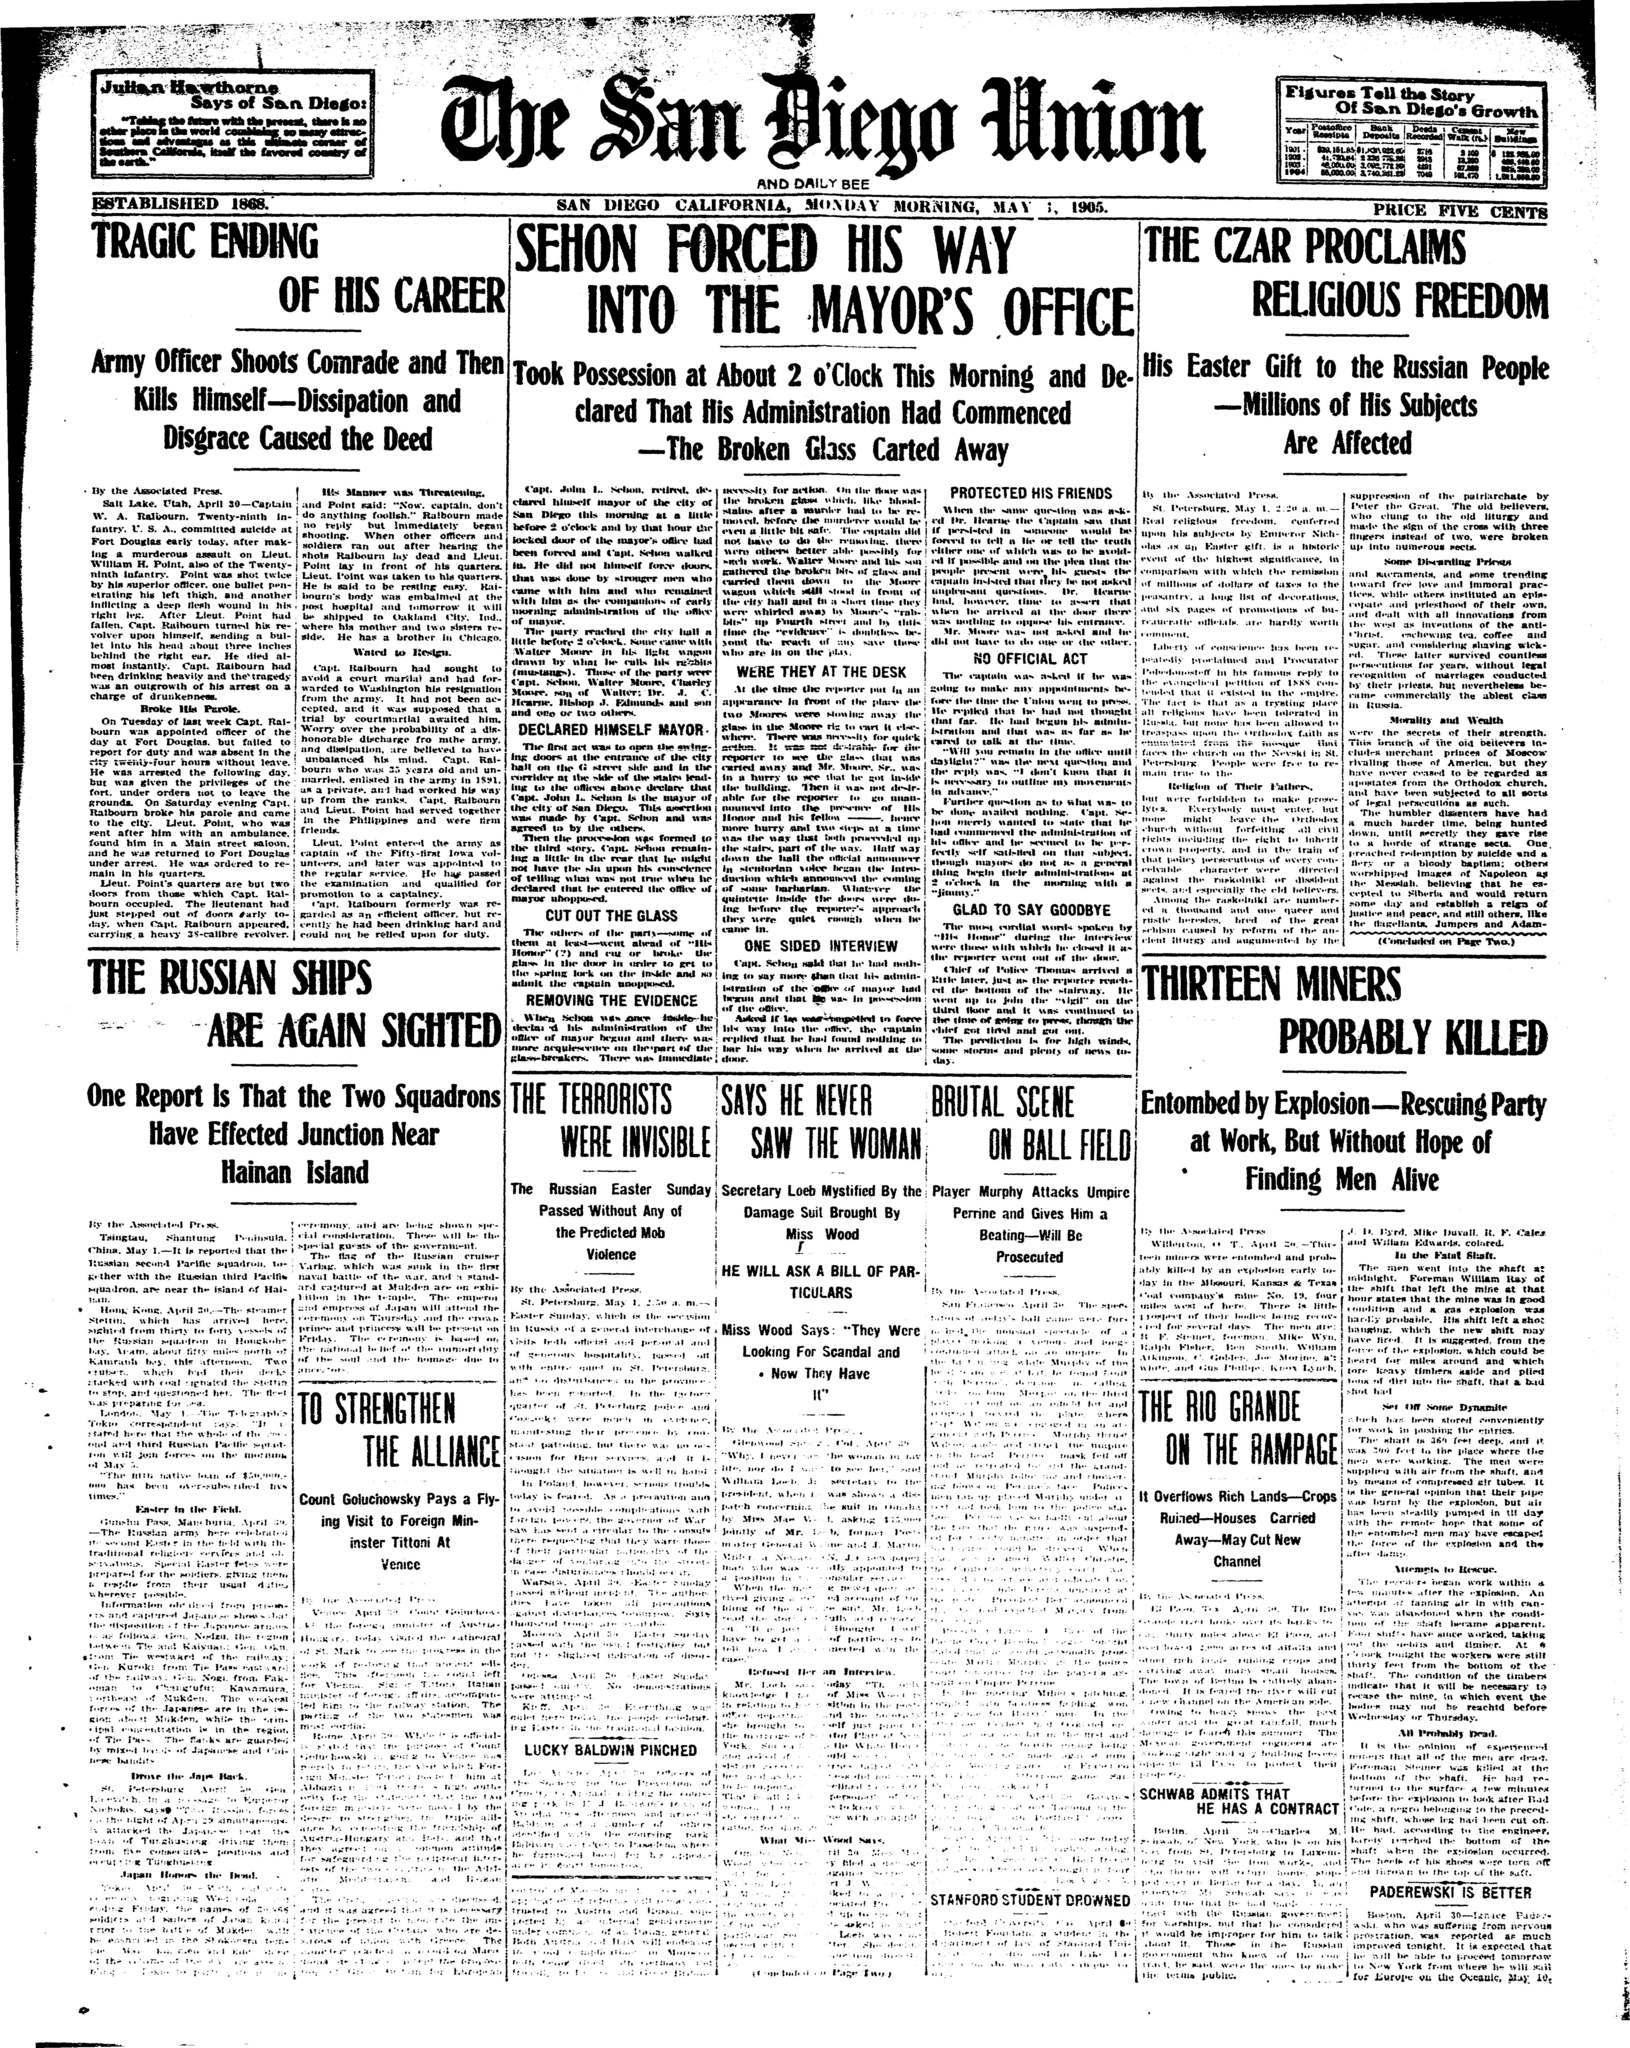 April 1, 1905